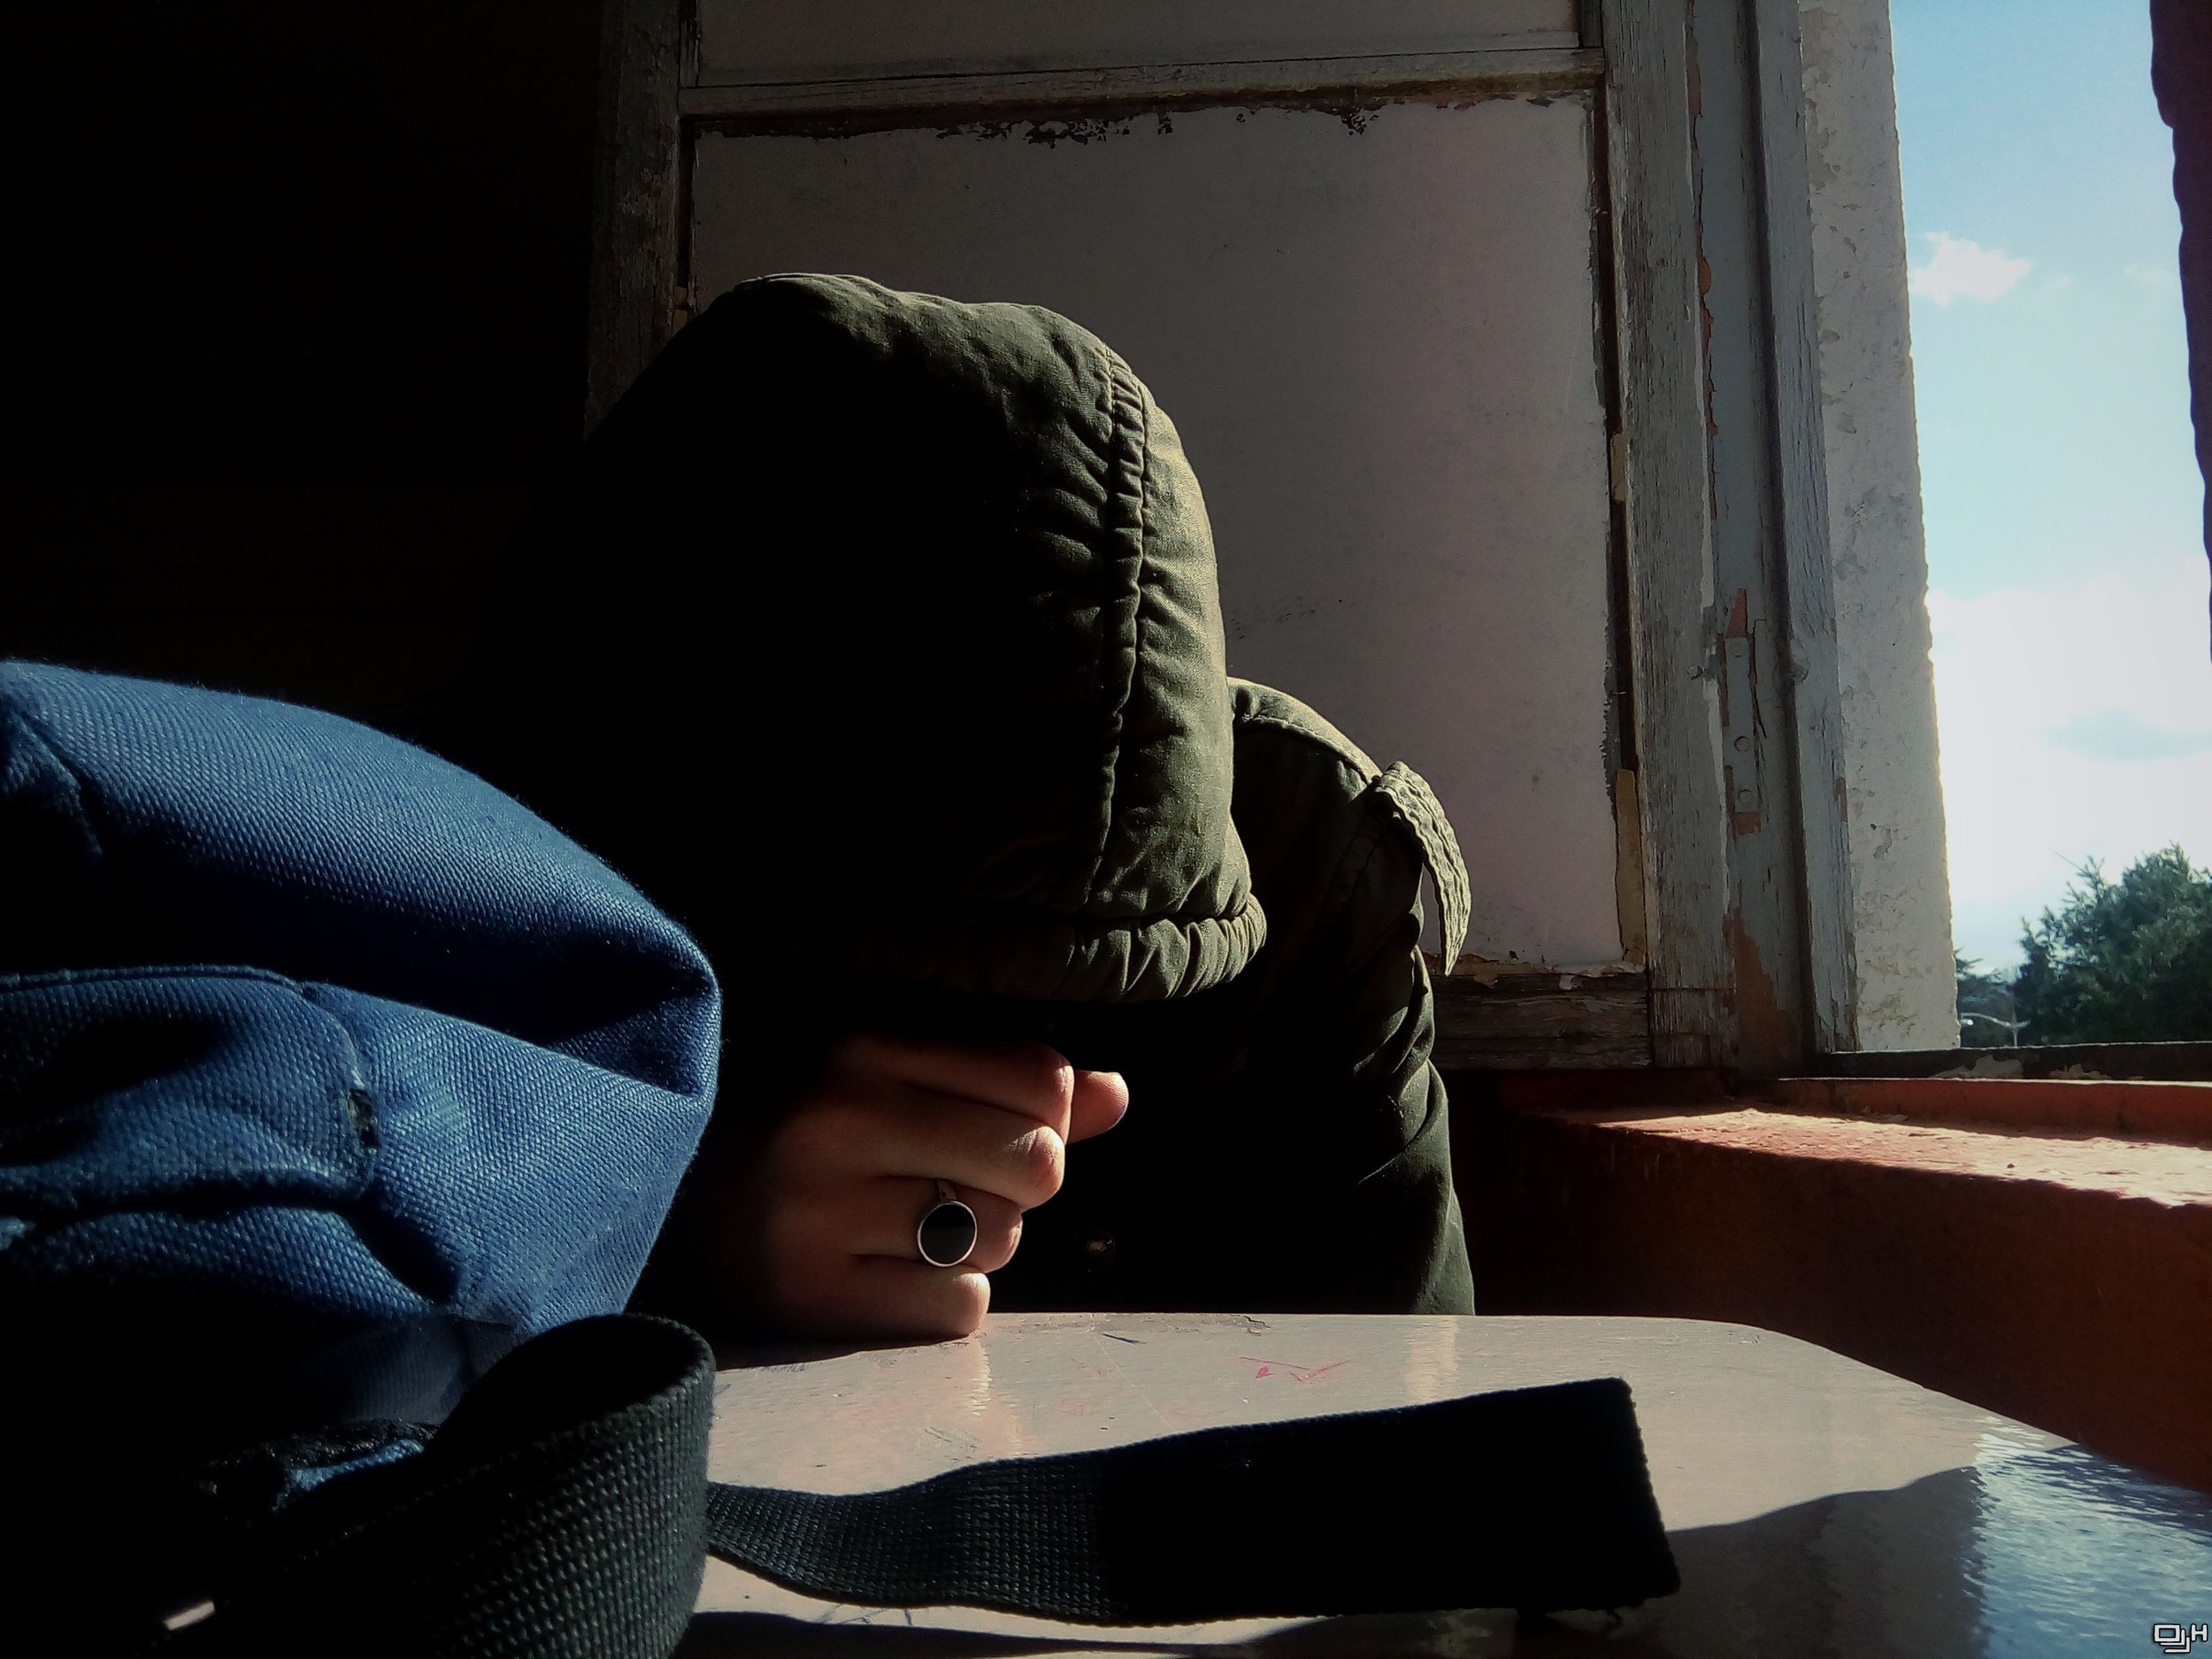 alone-depress-fist-328011.jpg